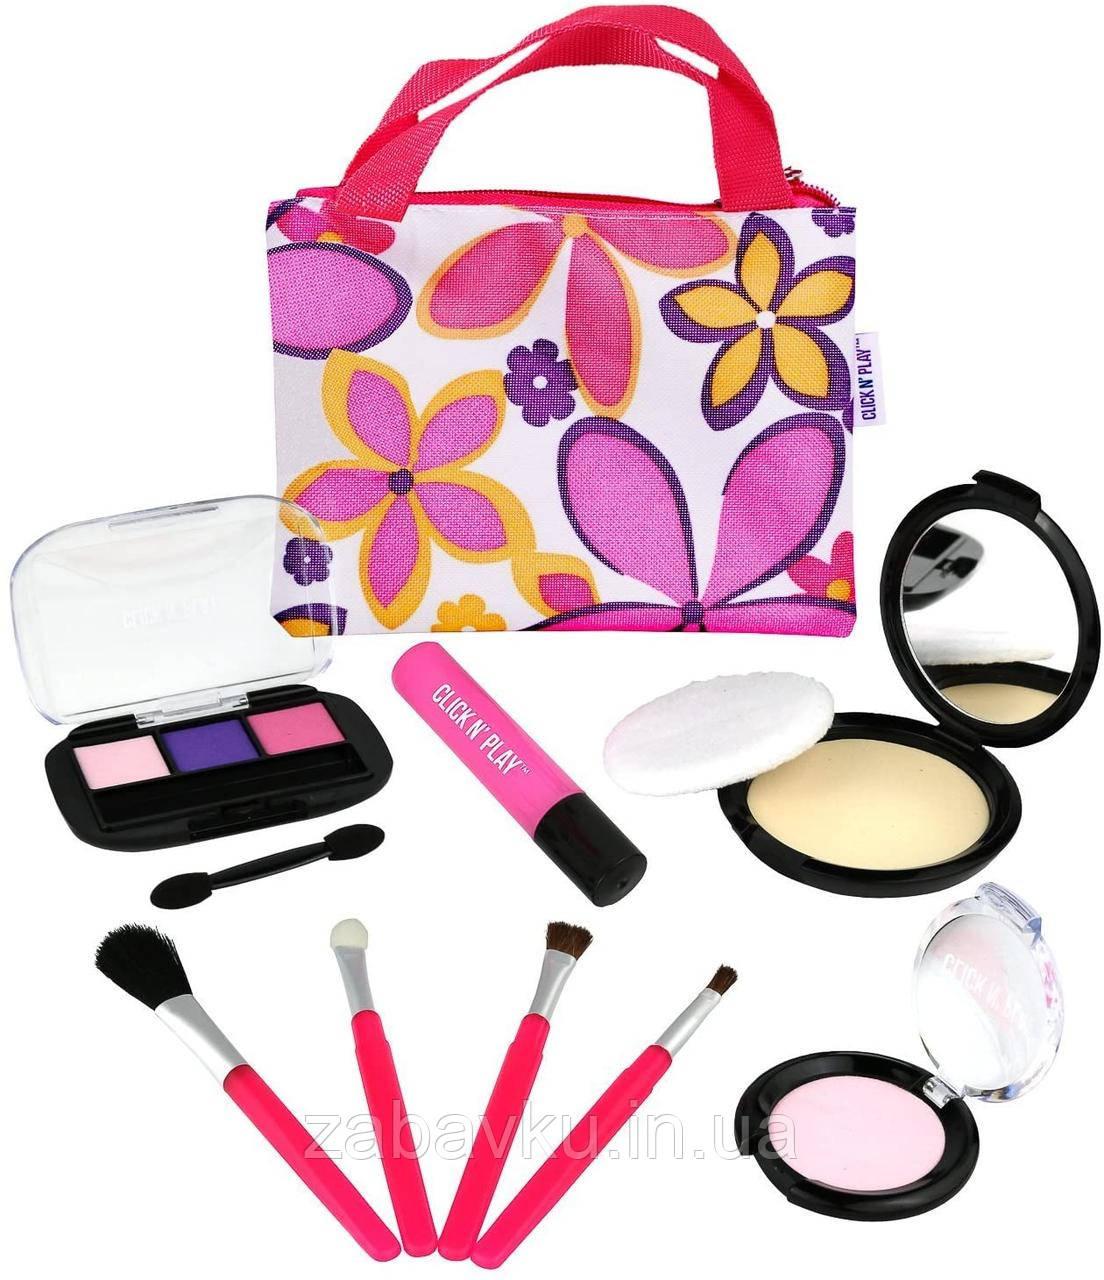 Набор игрушечной косметики для девочки Click N´ Play Pretend Play Cosmetic and Makeup Set